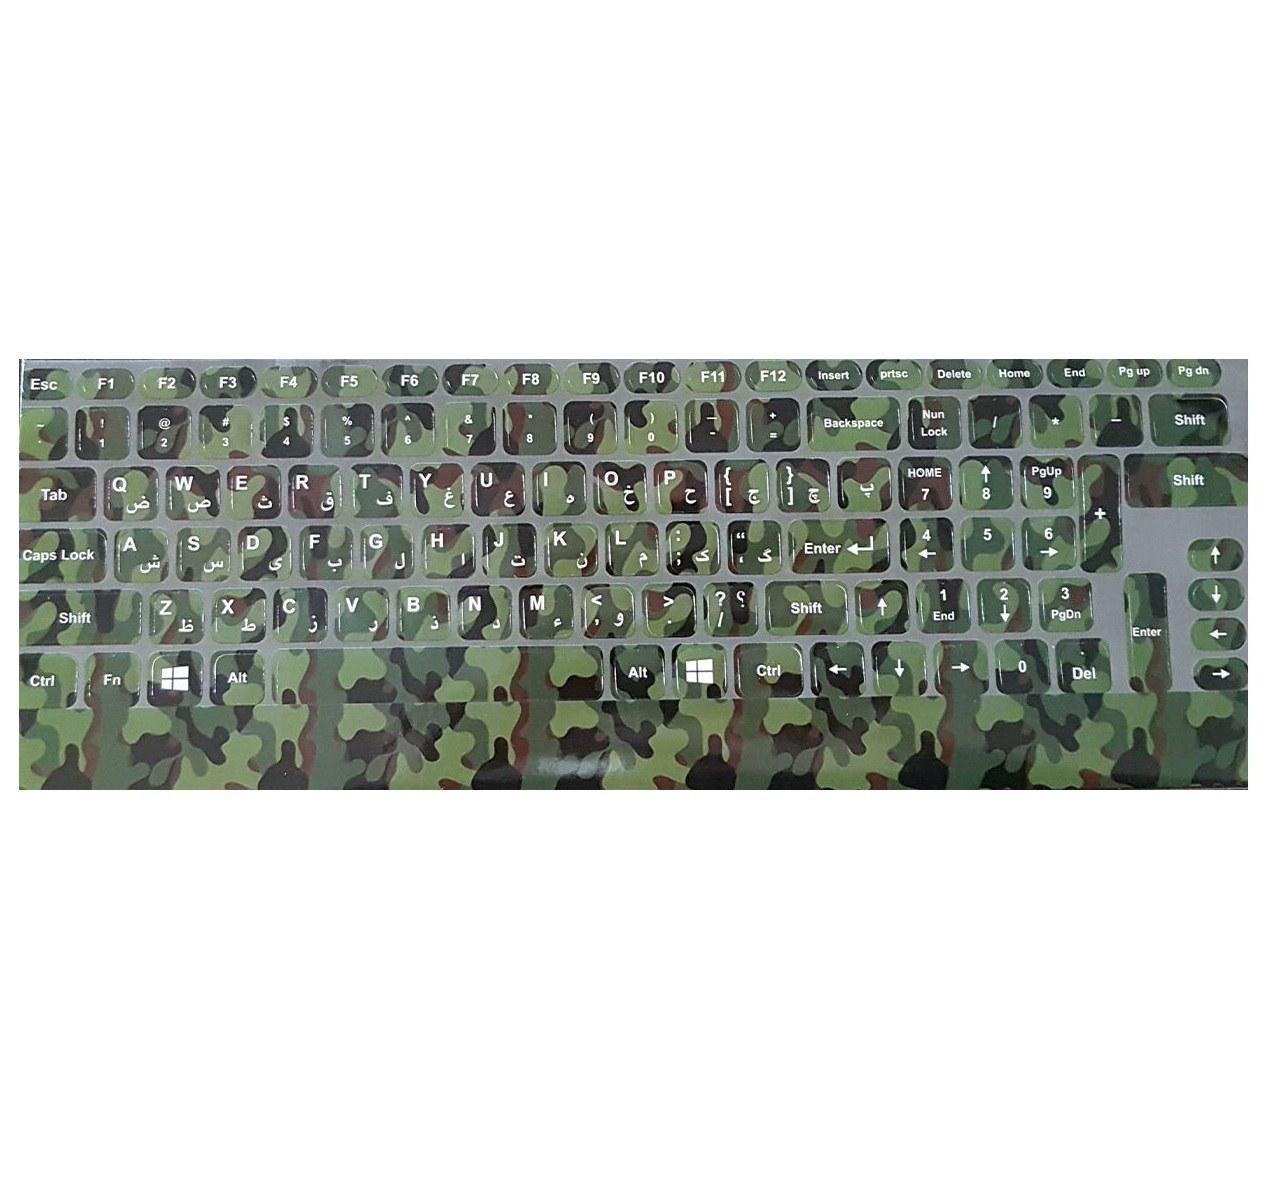 برچسب حروف فارسی کیبورد طرح ارتشی